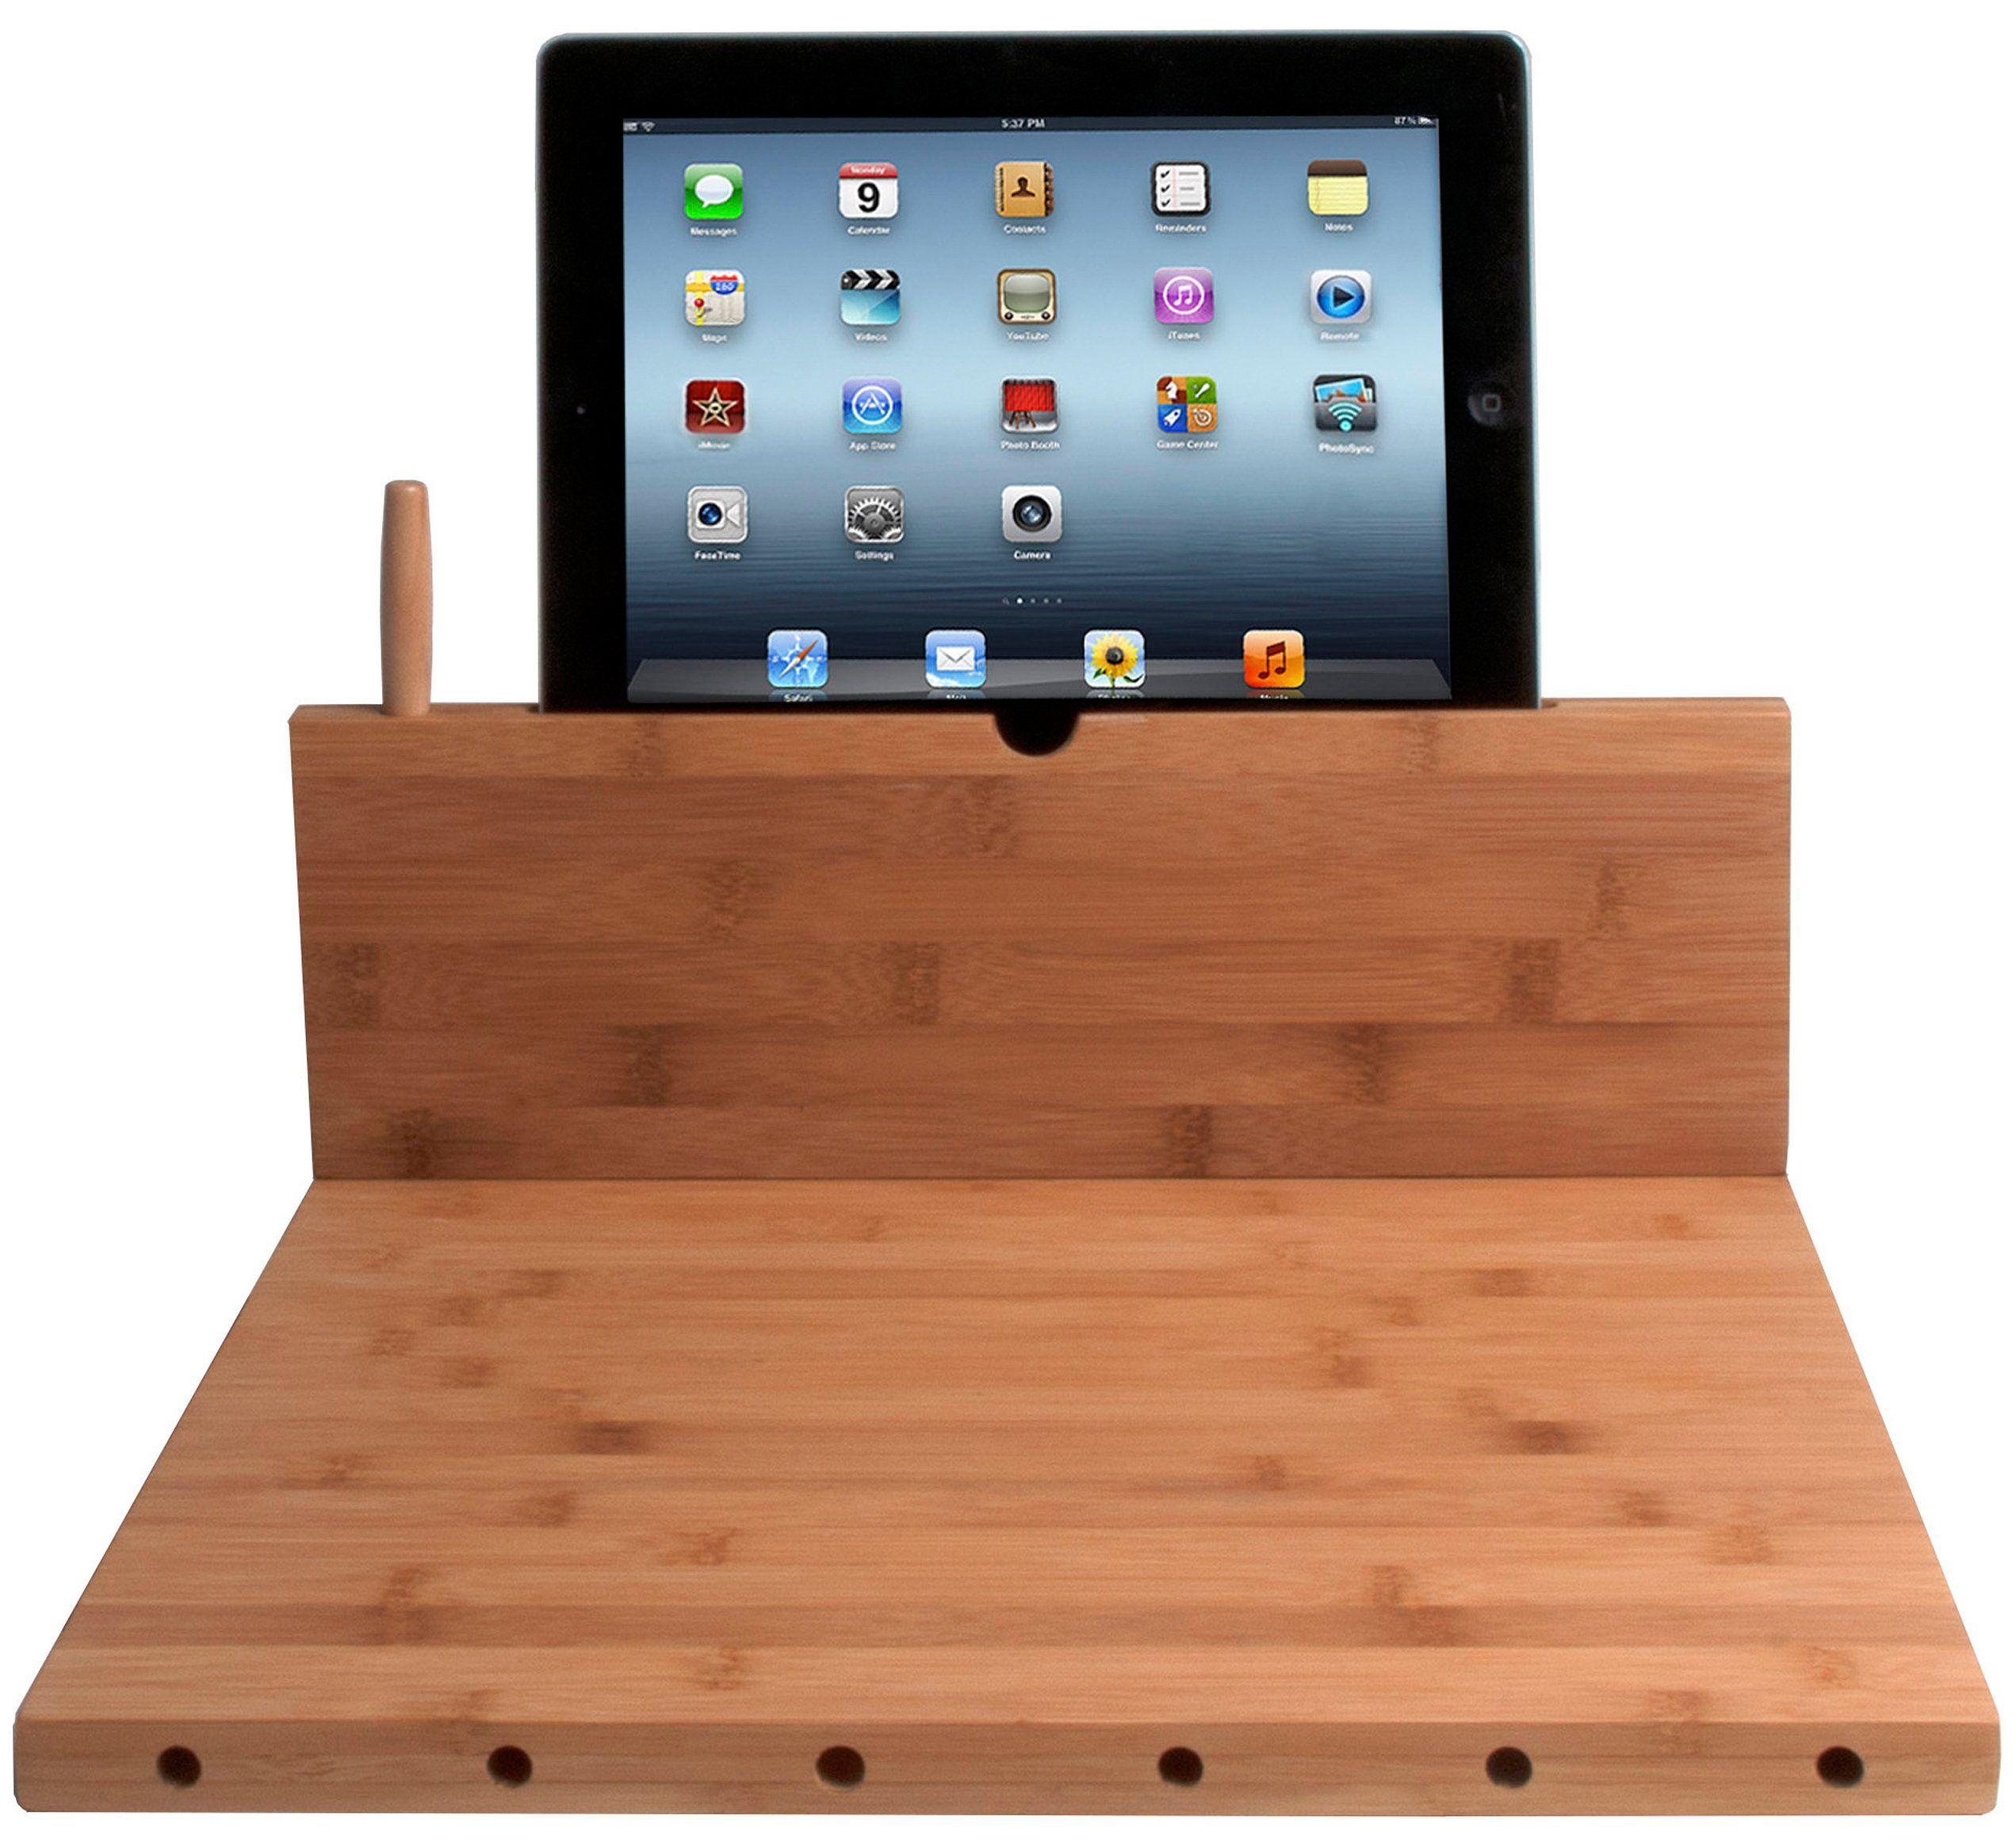 Cta digital bamboo cutting board with ipad stand stylus and knife